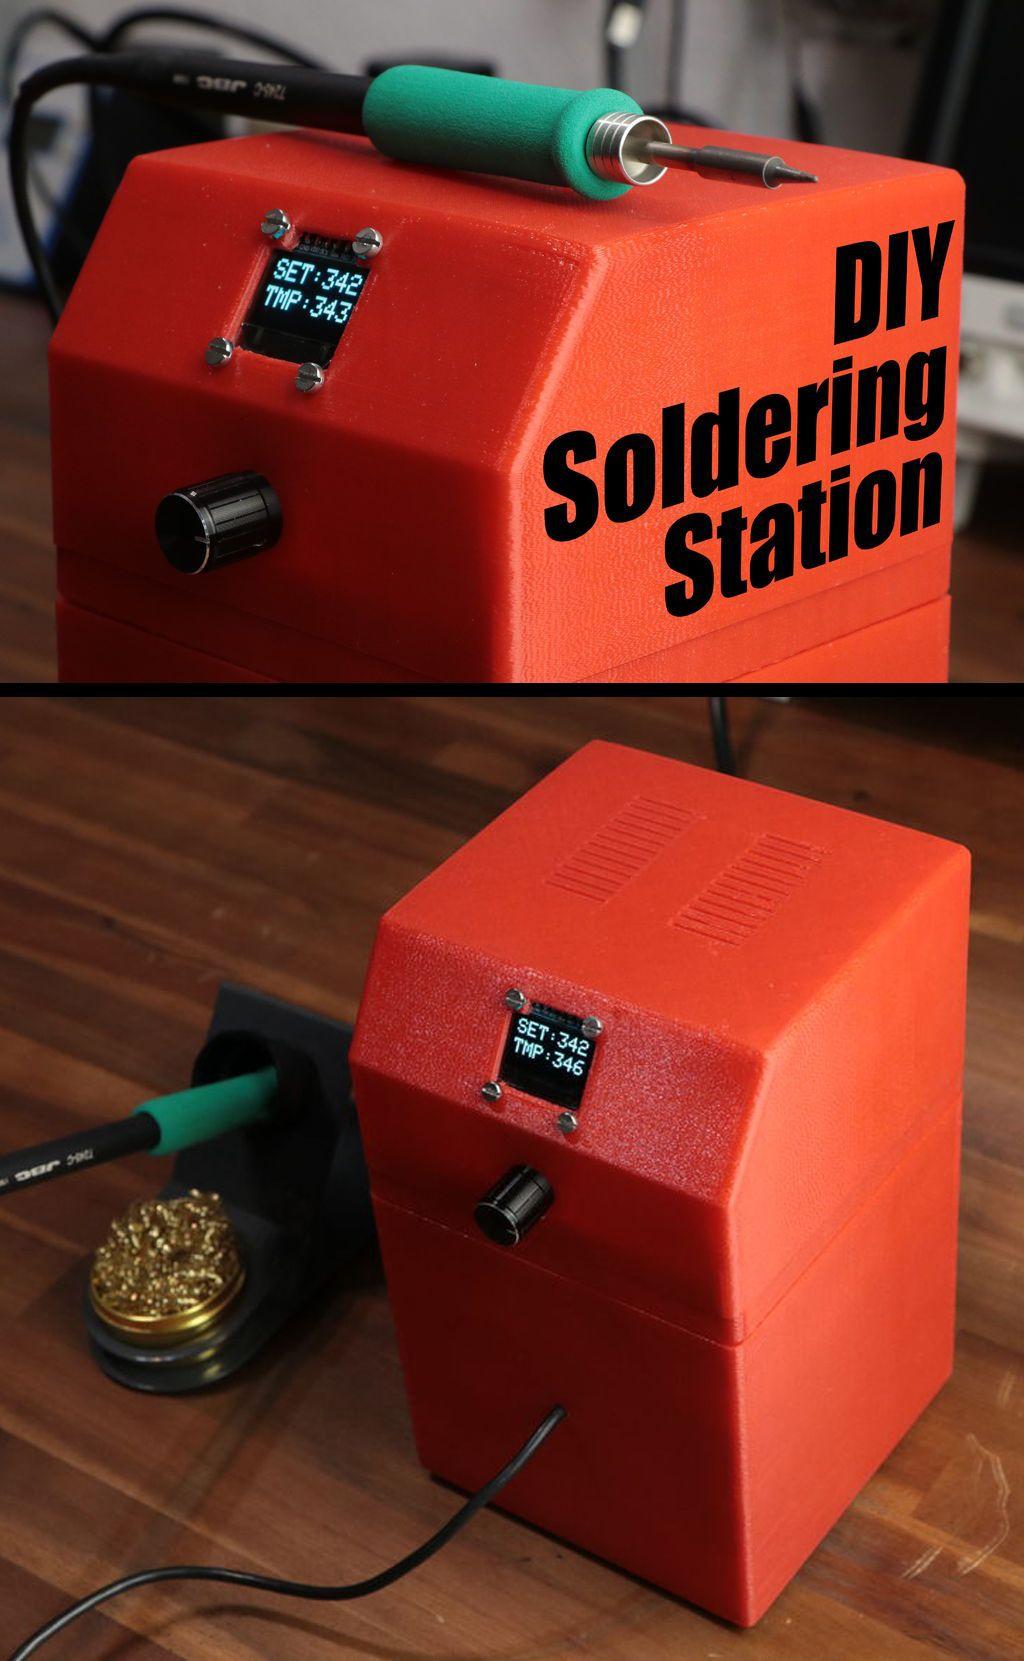 Diy arduino soldering station soldering iron arduino and iron diy arduino soldering station solutioingenieria Images